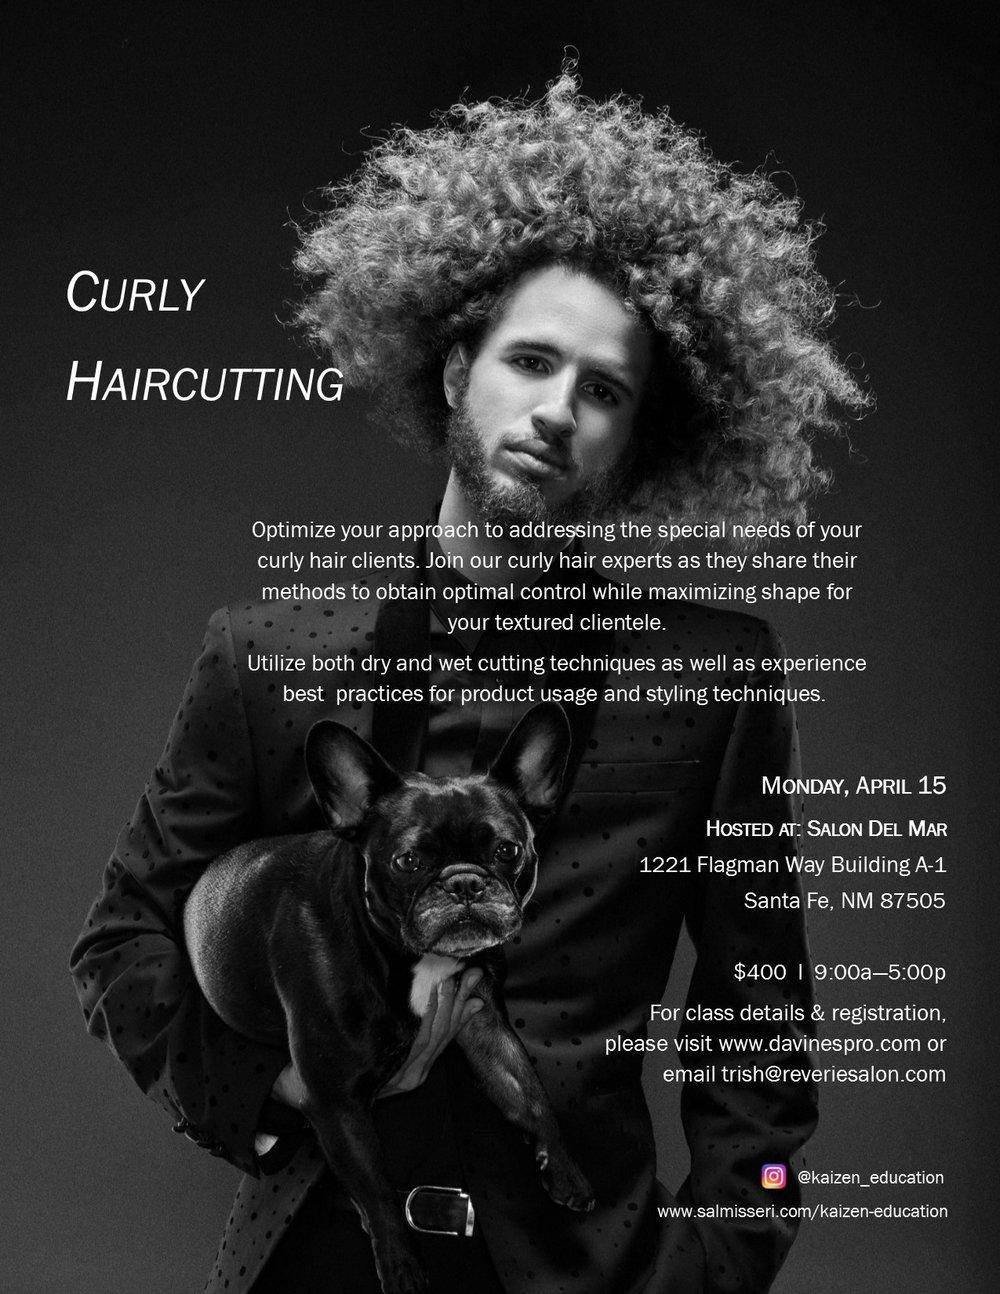 CurlyHaircuttingApril15 @Salon Del Mar.jpg